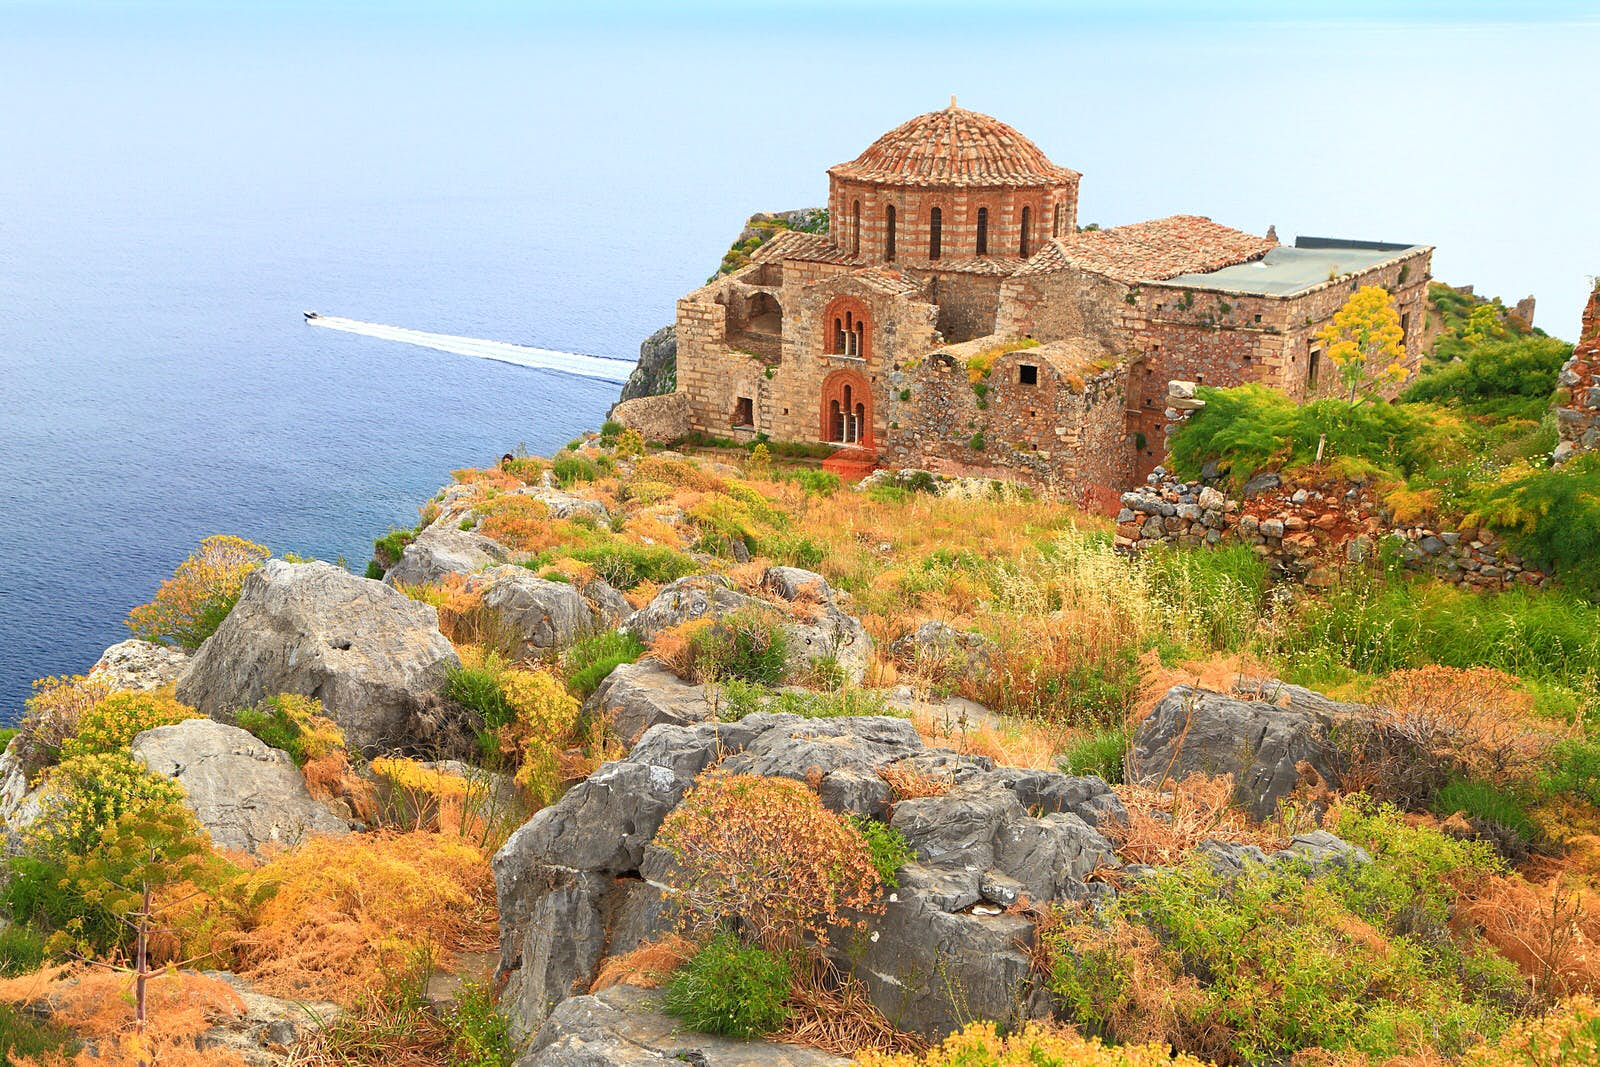 Church of Agia Sofia on Monemvasia island © Inu / Shutterstock